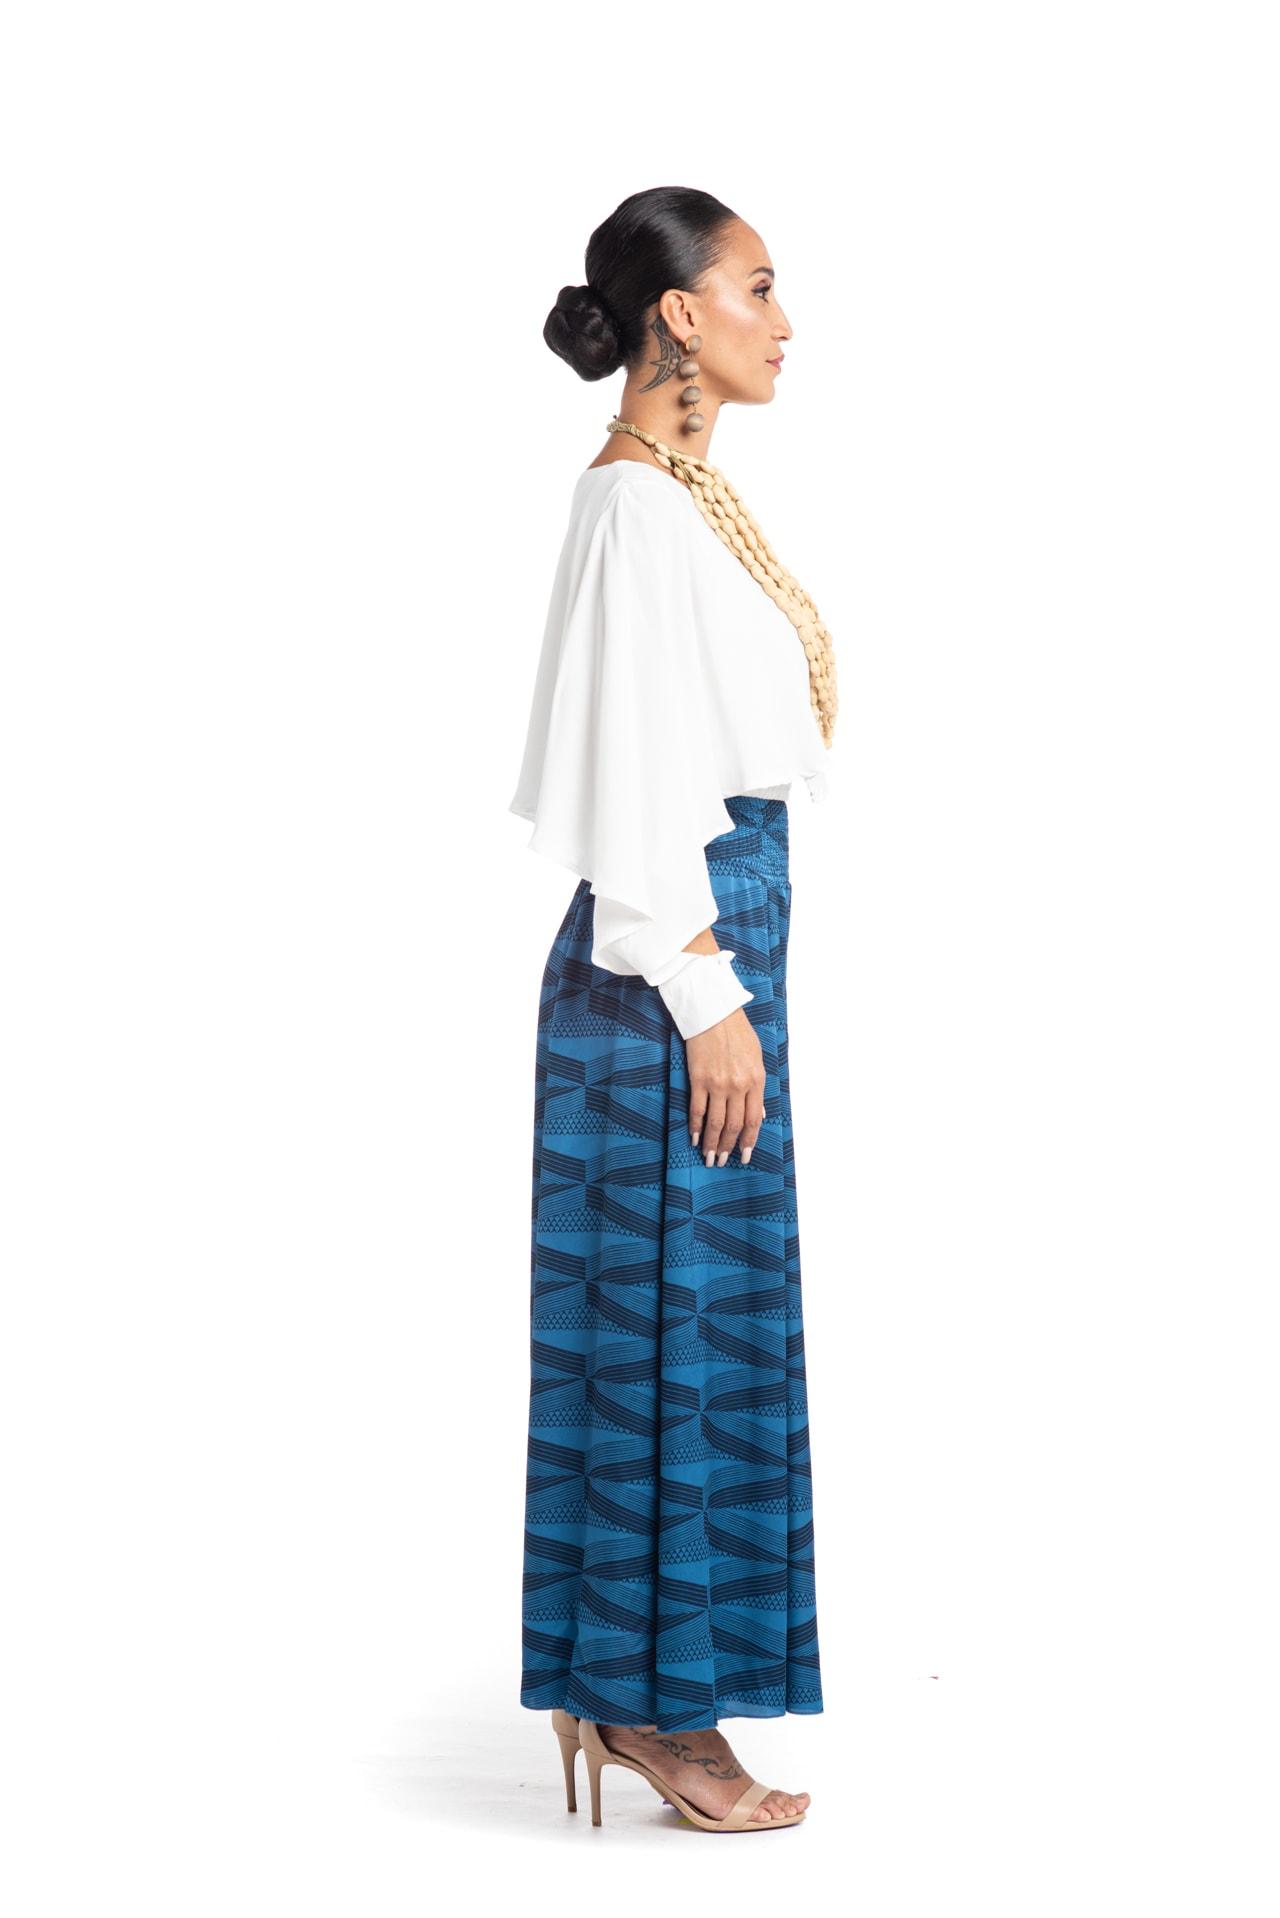 Model wearing Huakai Pant in Blue - Side View